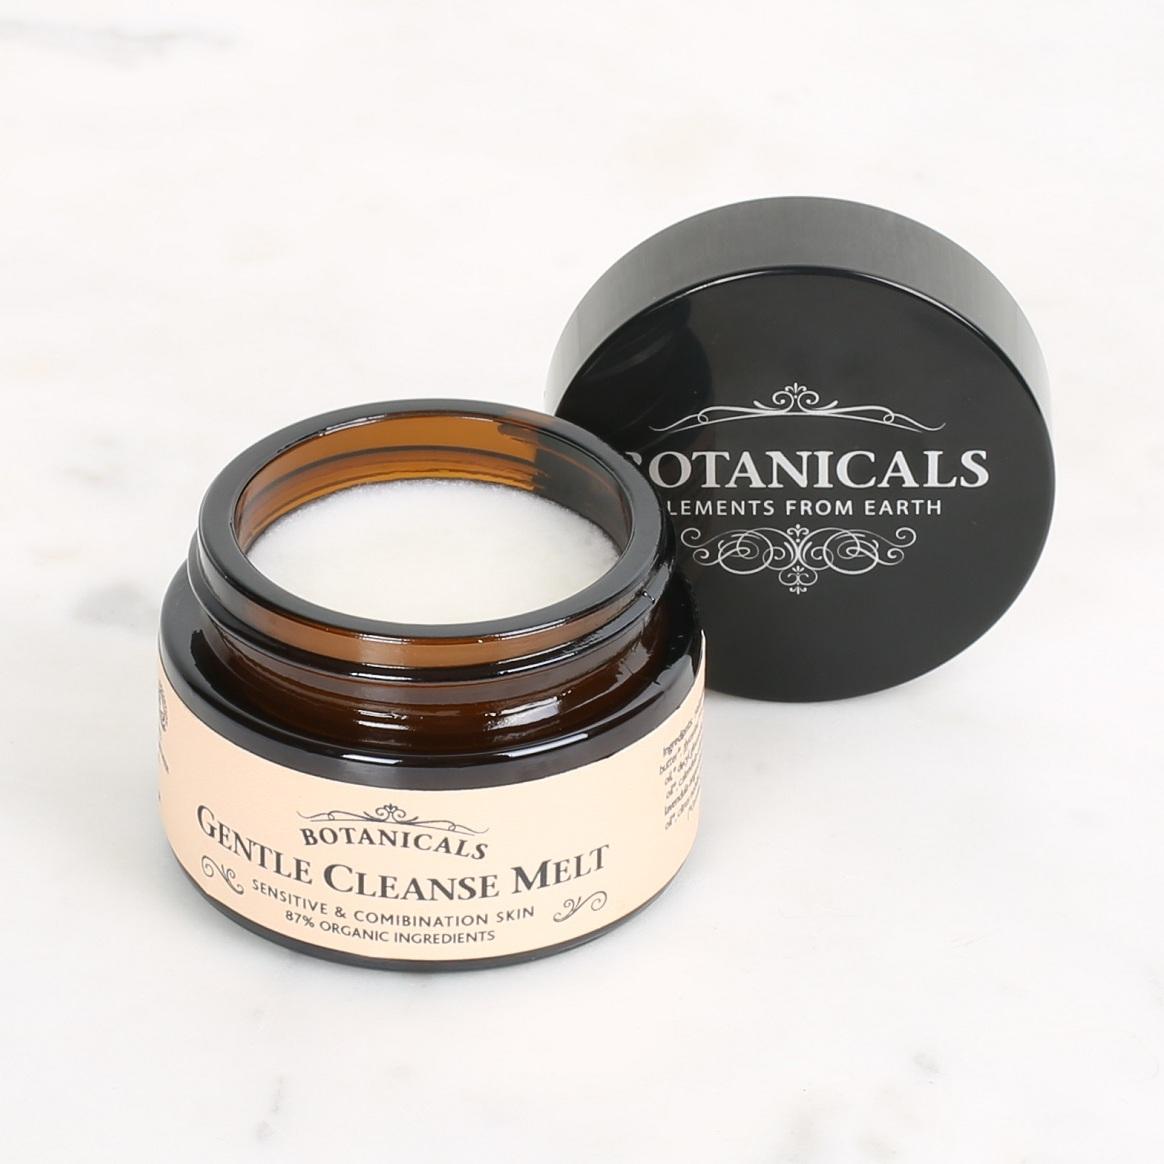 Botanicals Gentle Cleanse Melt